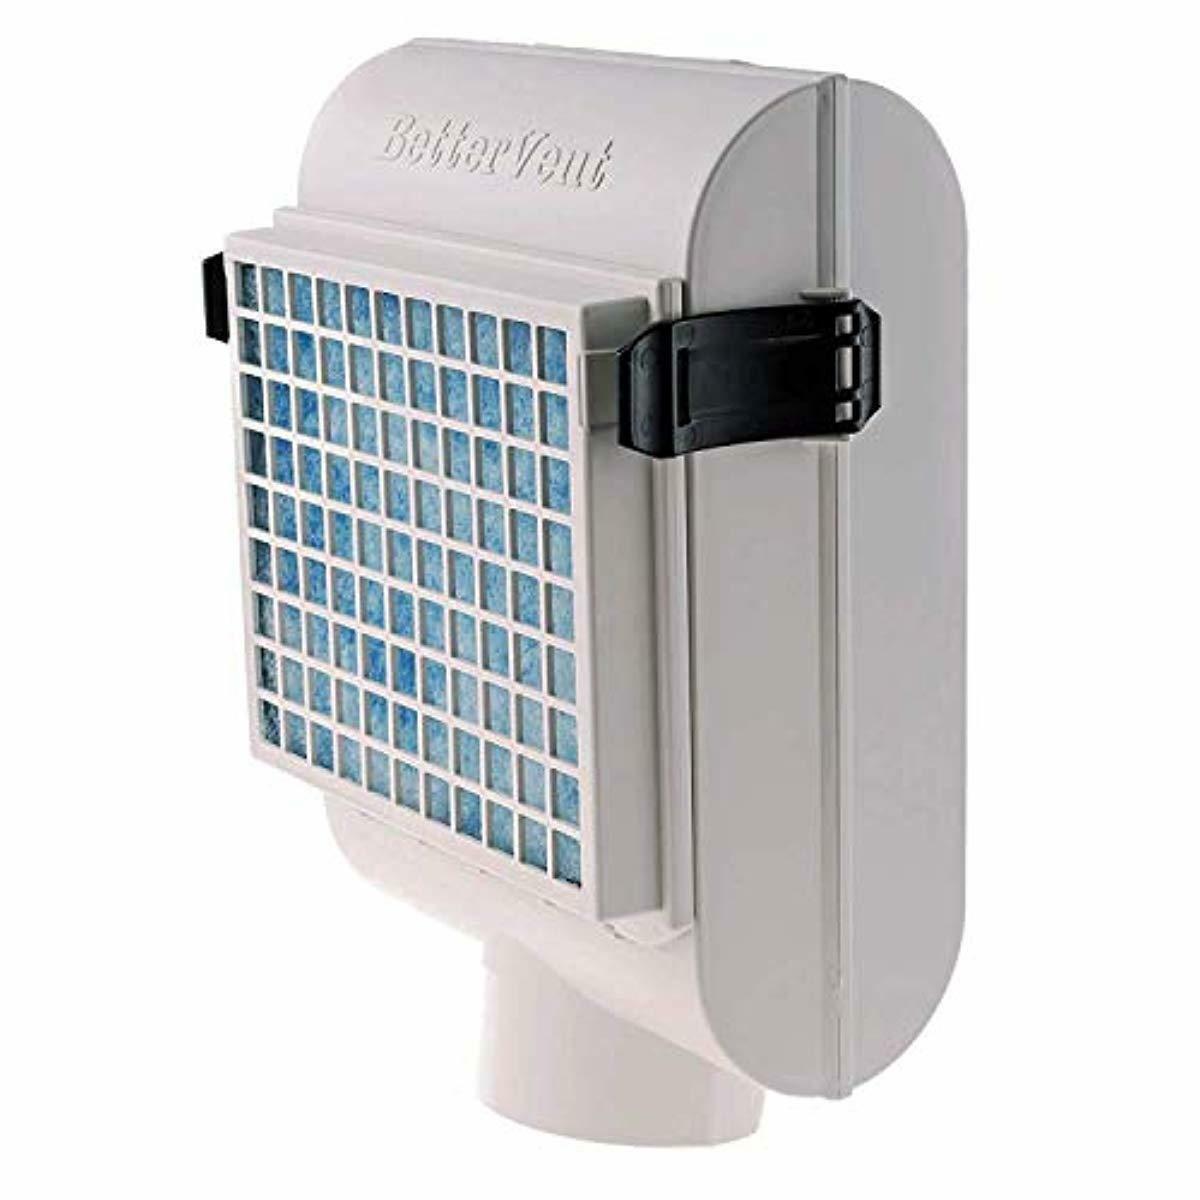 BetterVent Indoor Dryer Vent Kit Protect Indoor Air Quality